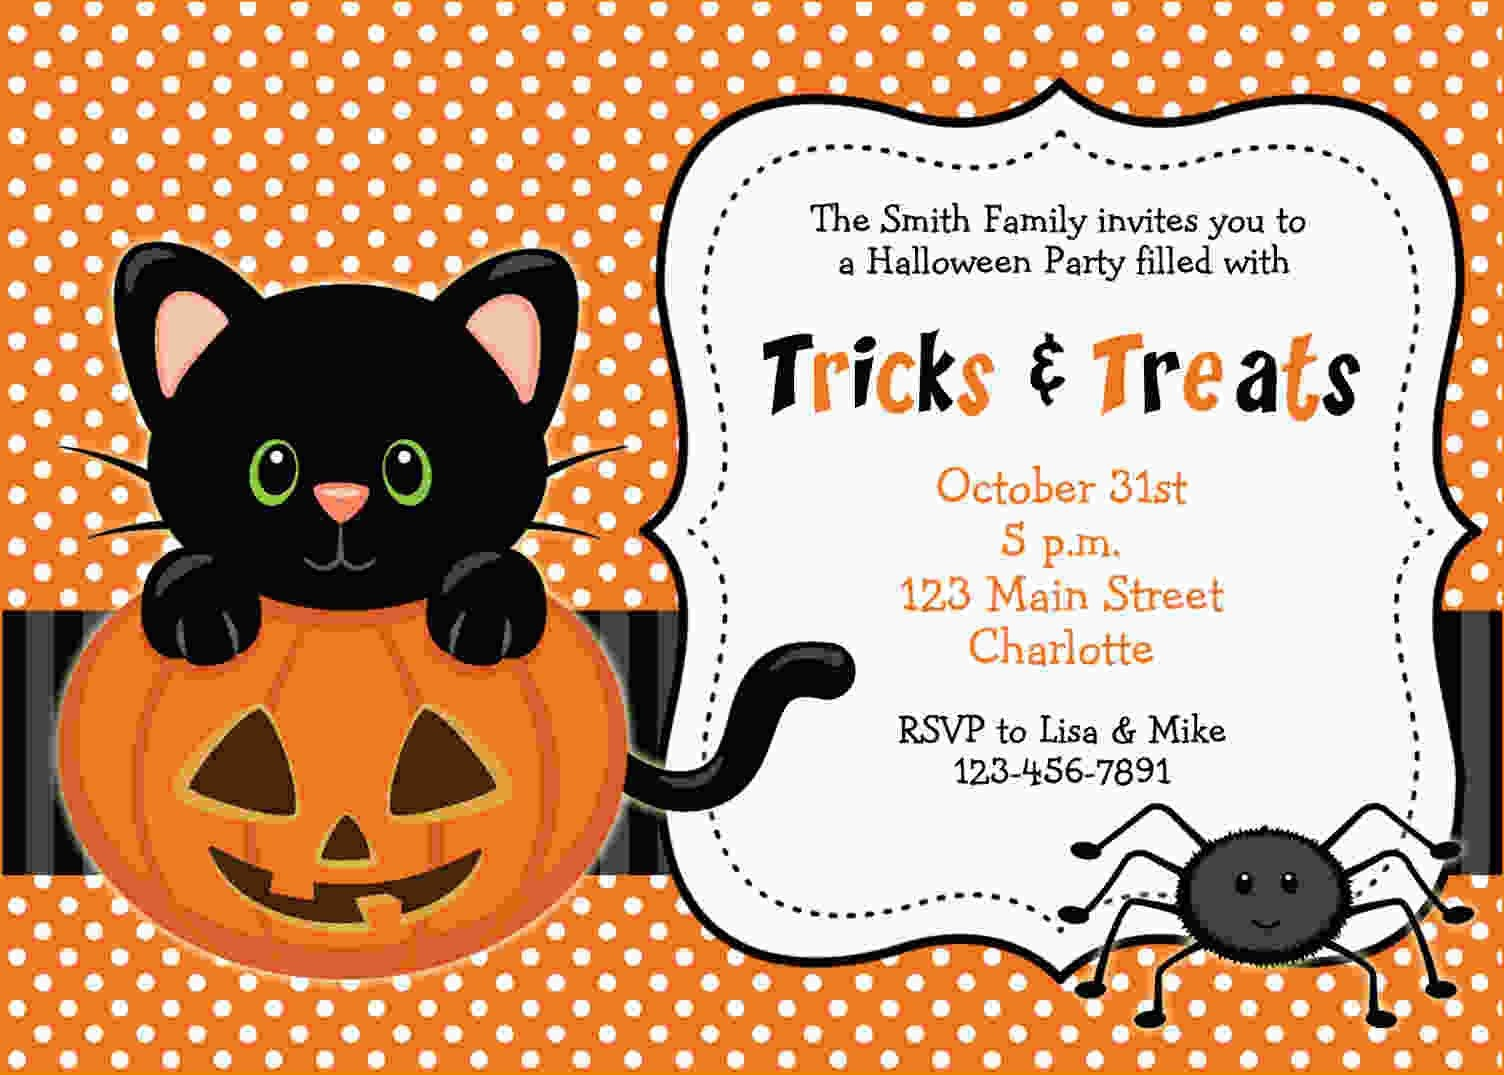 Free Printable Halloween Invitations   Free Printable Birthday - Free Printable Halloween Party Invitations